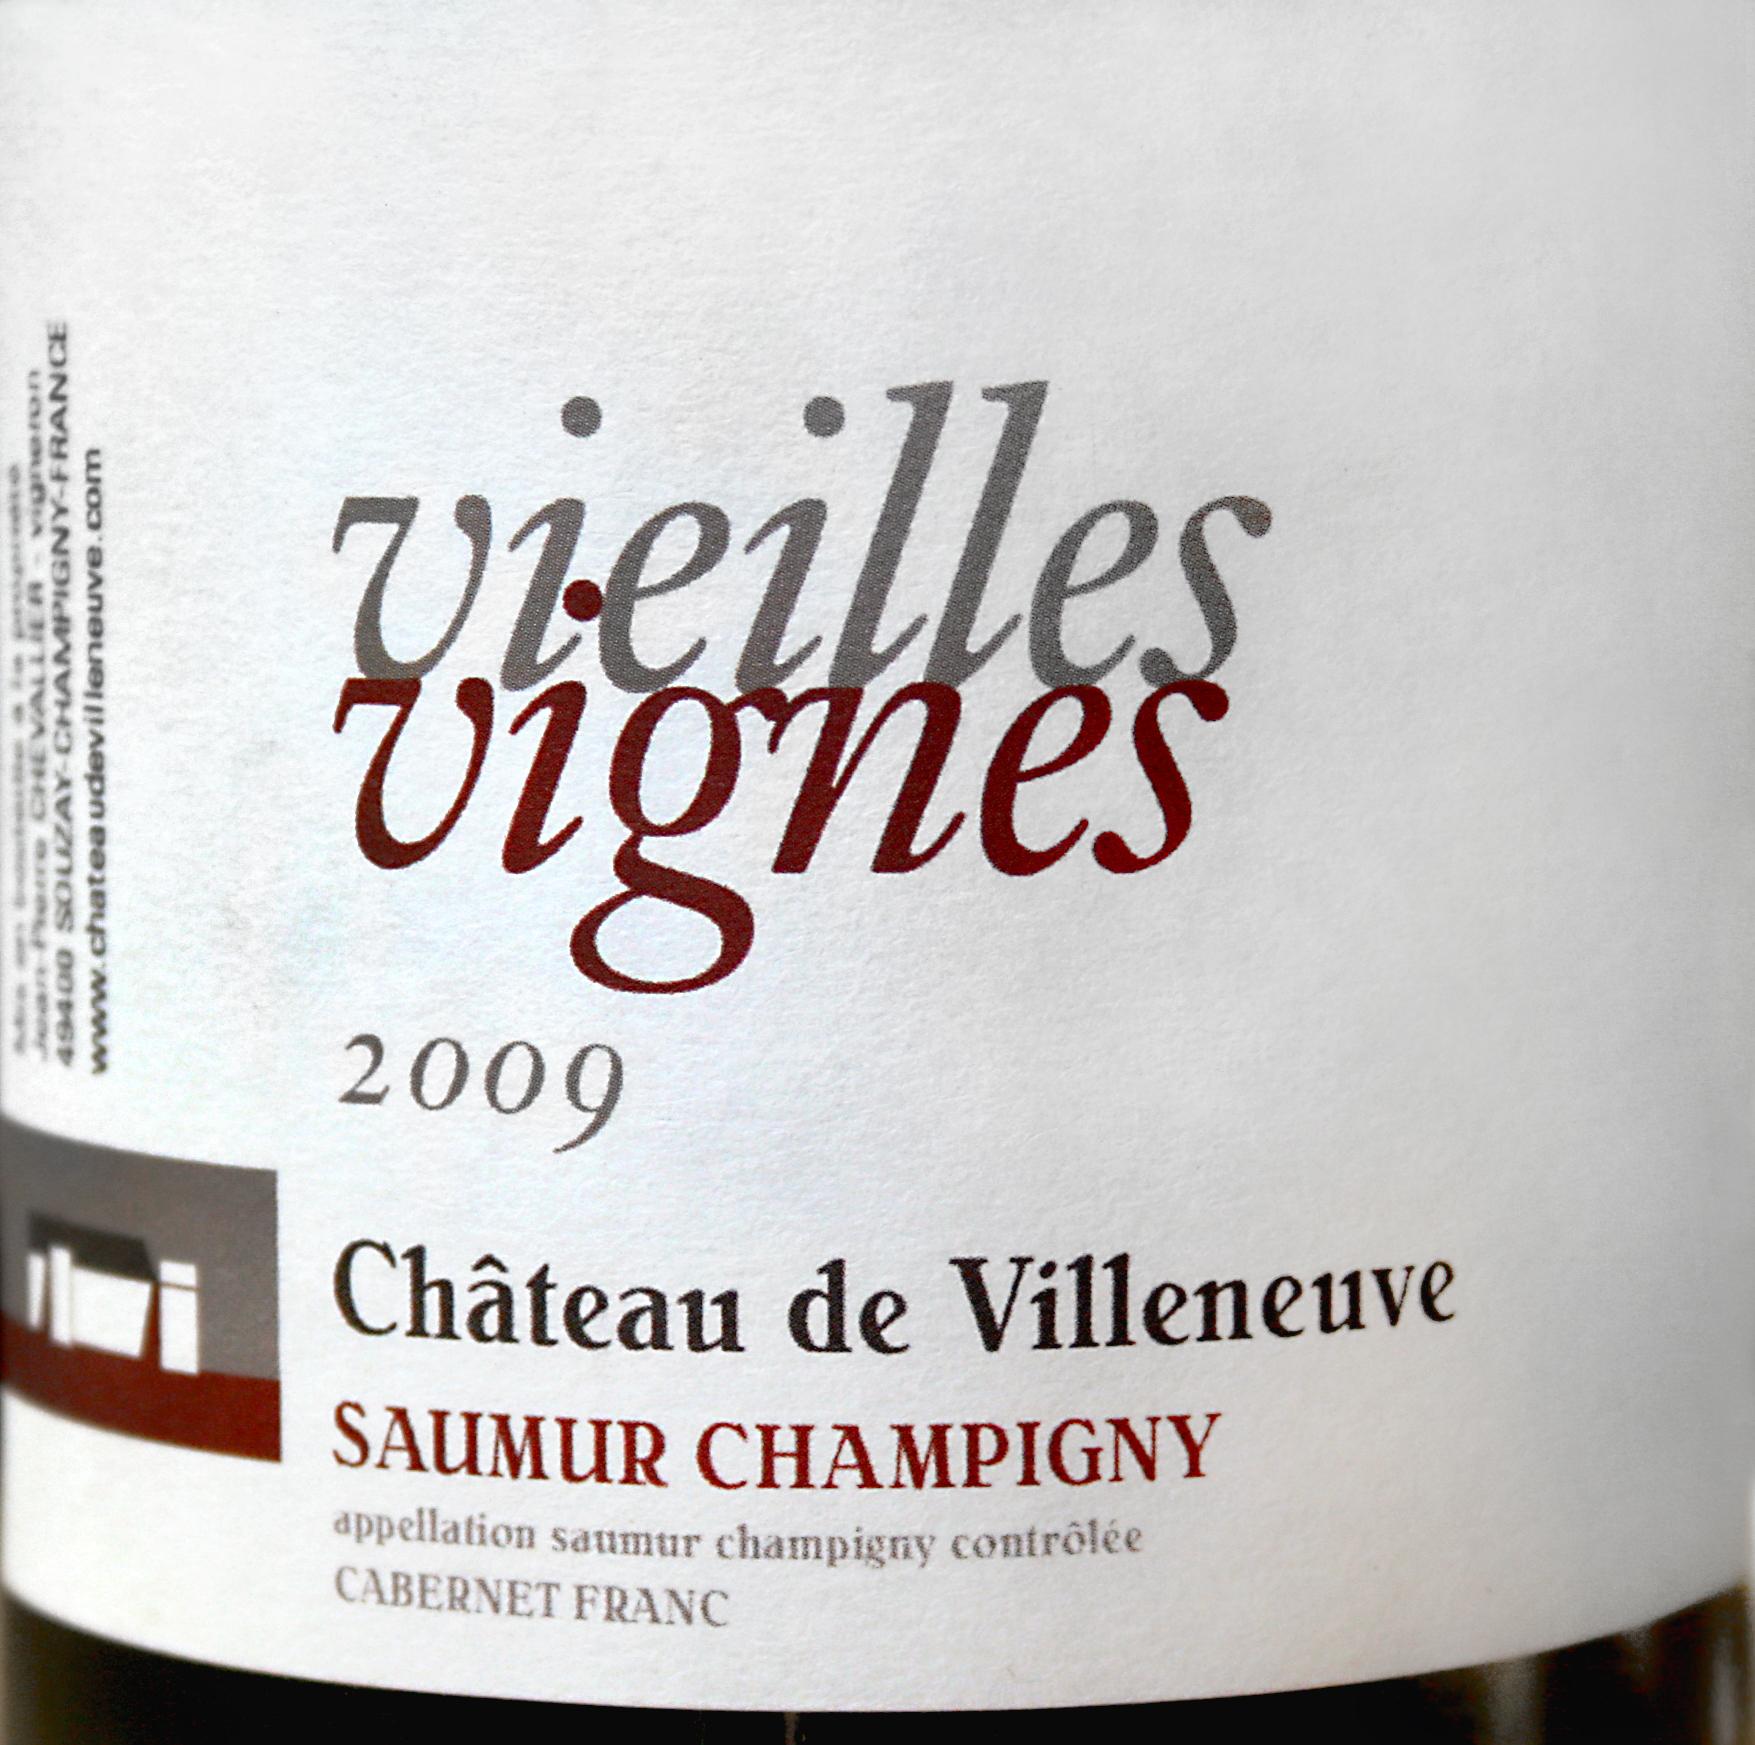 2009 Saumur Champigny, Vieilles Vignes